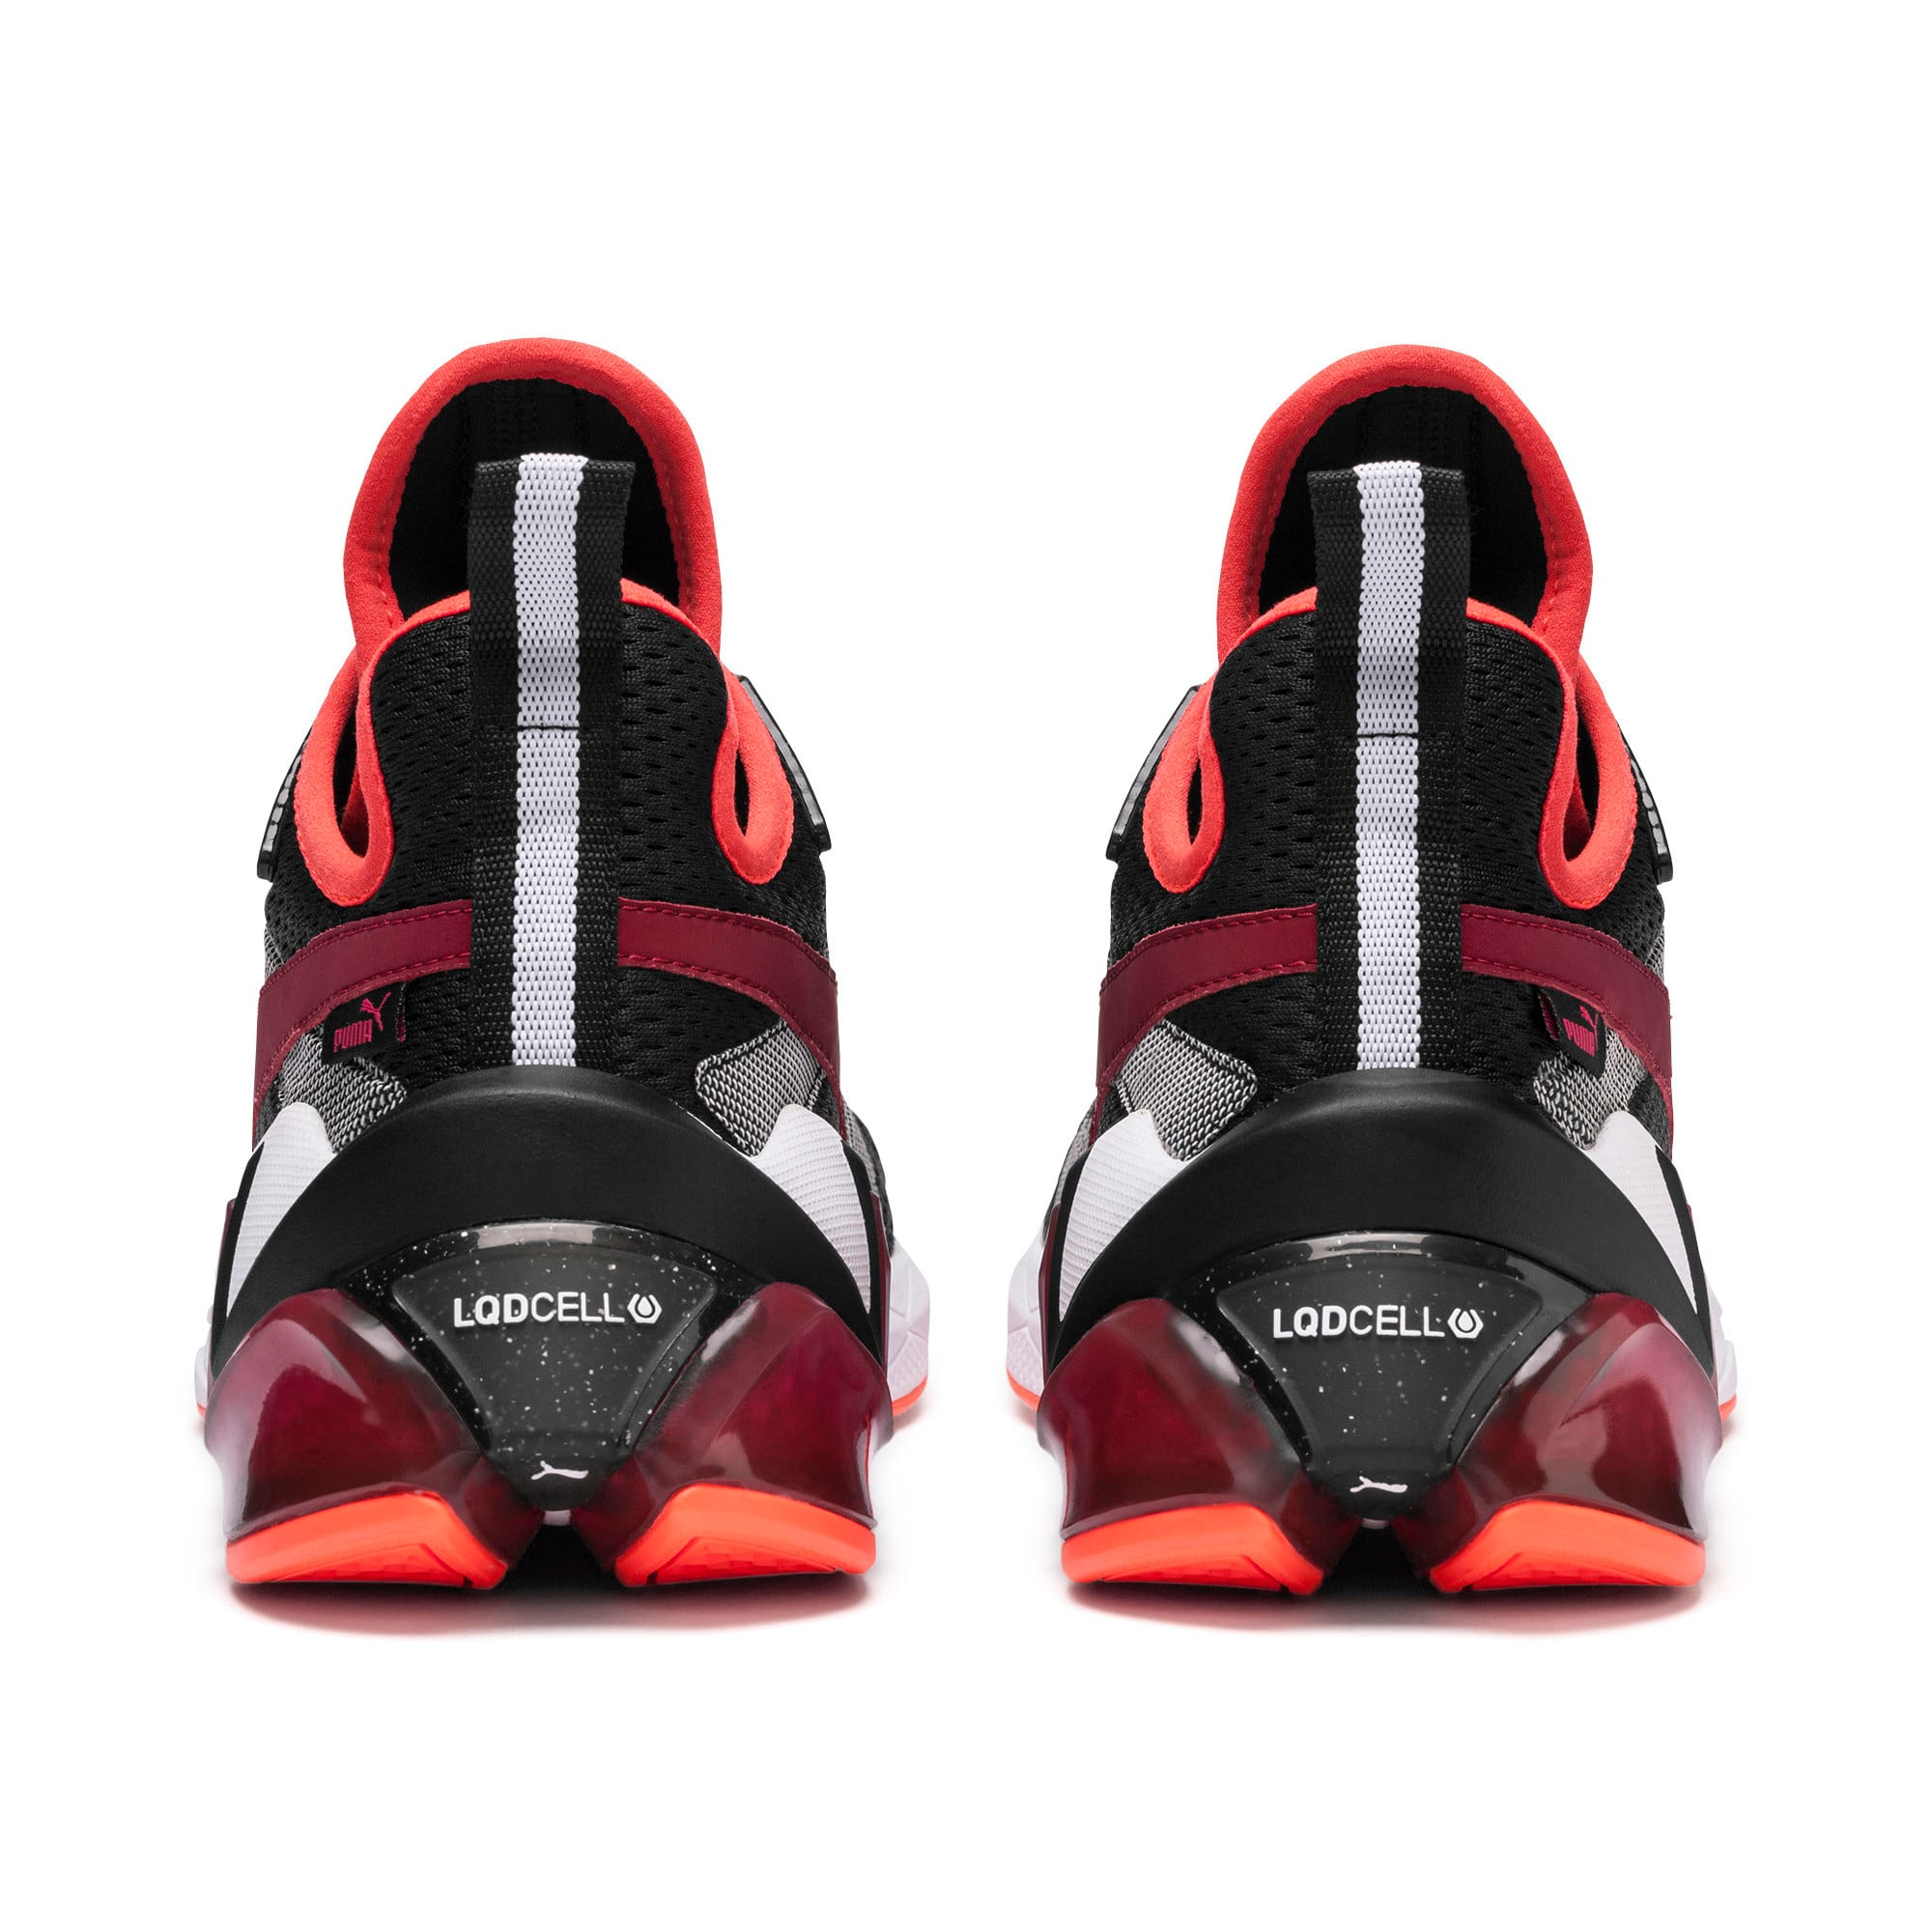 Thumbnail 4 of LQDCELL Origin Tech Men's Shoes, Puma Black-Rhubarb, medium